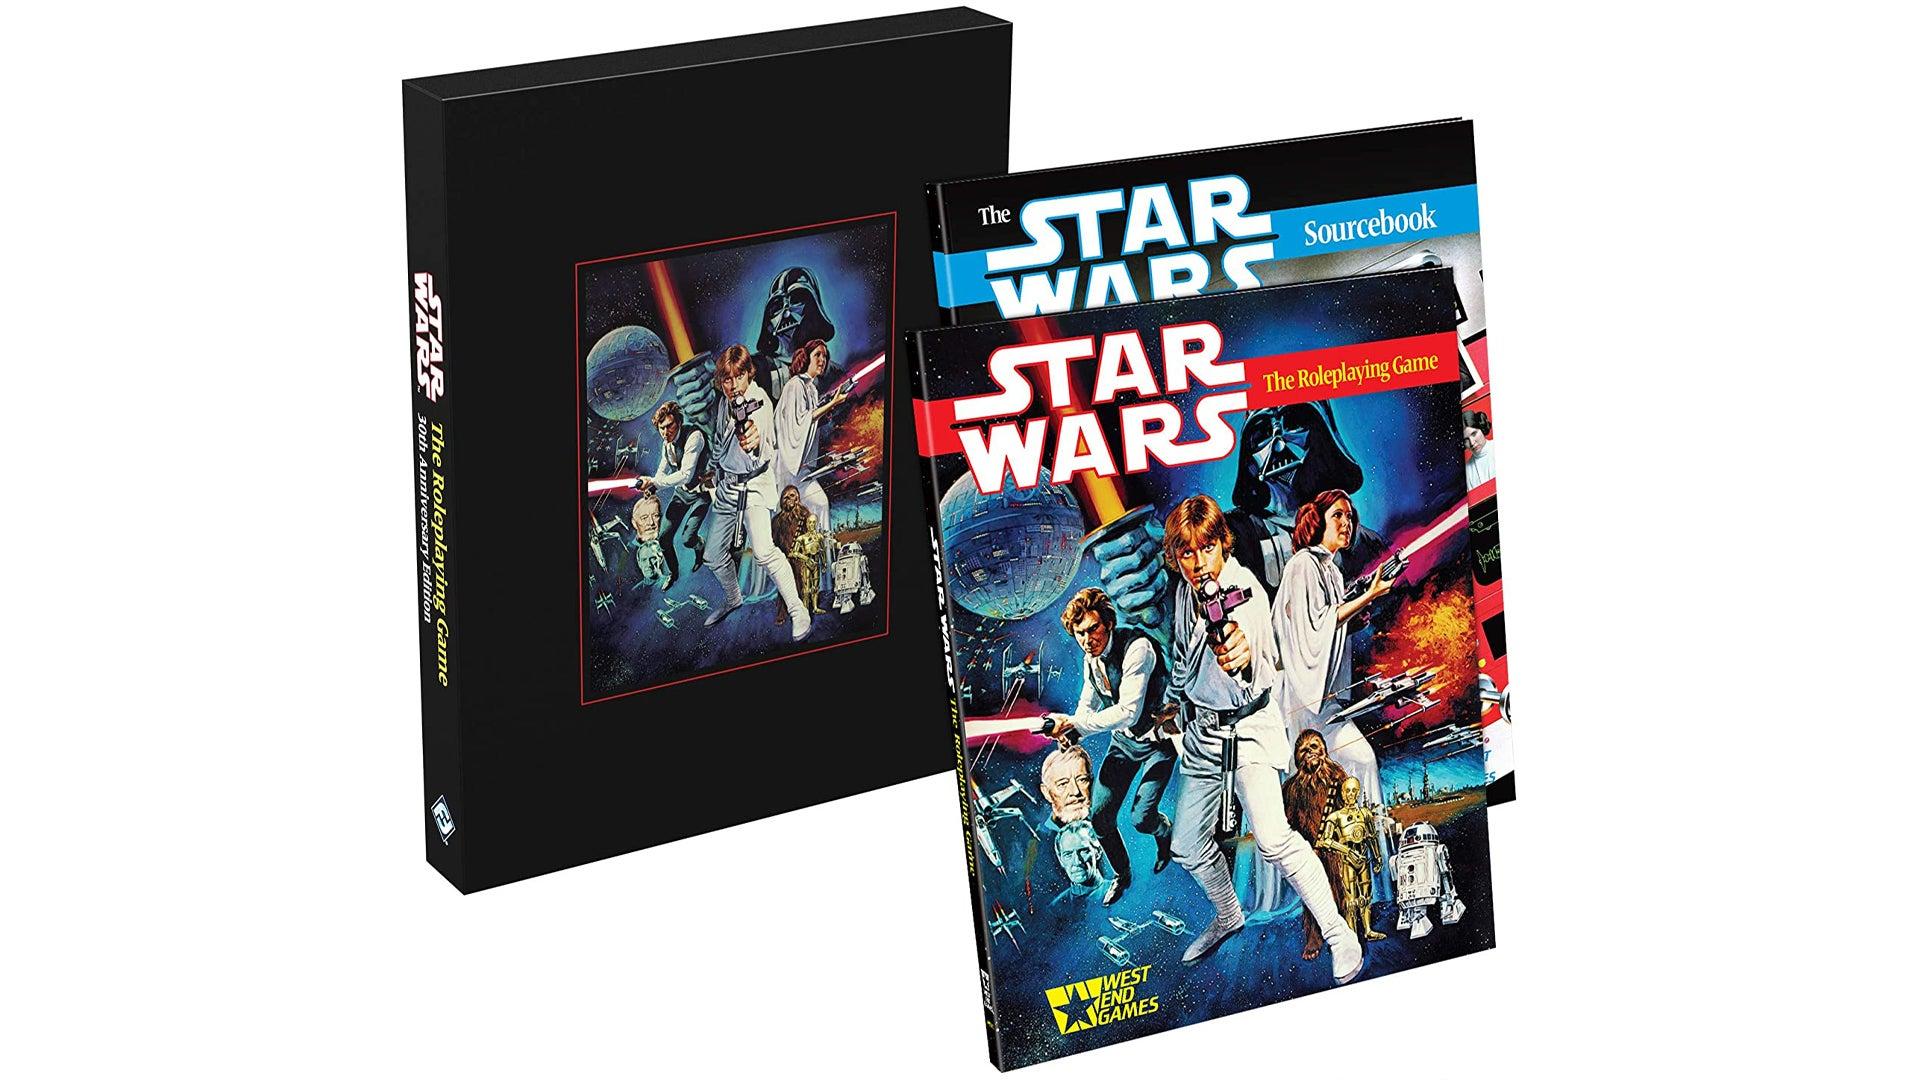 star-wars-the-rpg-anniversary-edition-books.jpg